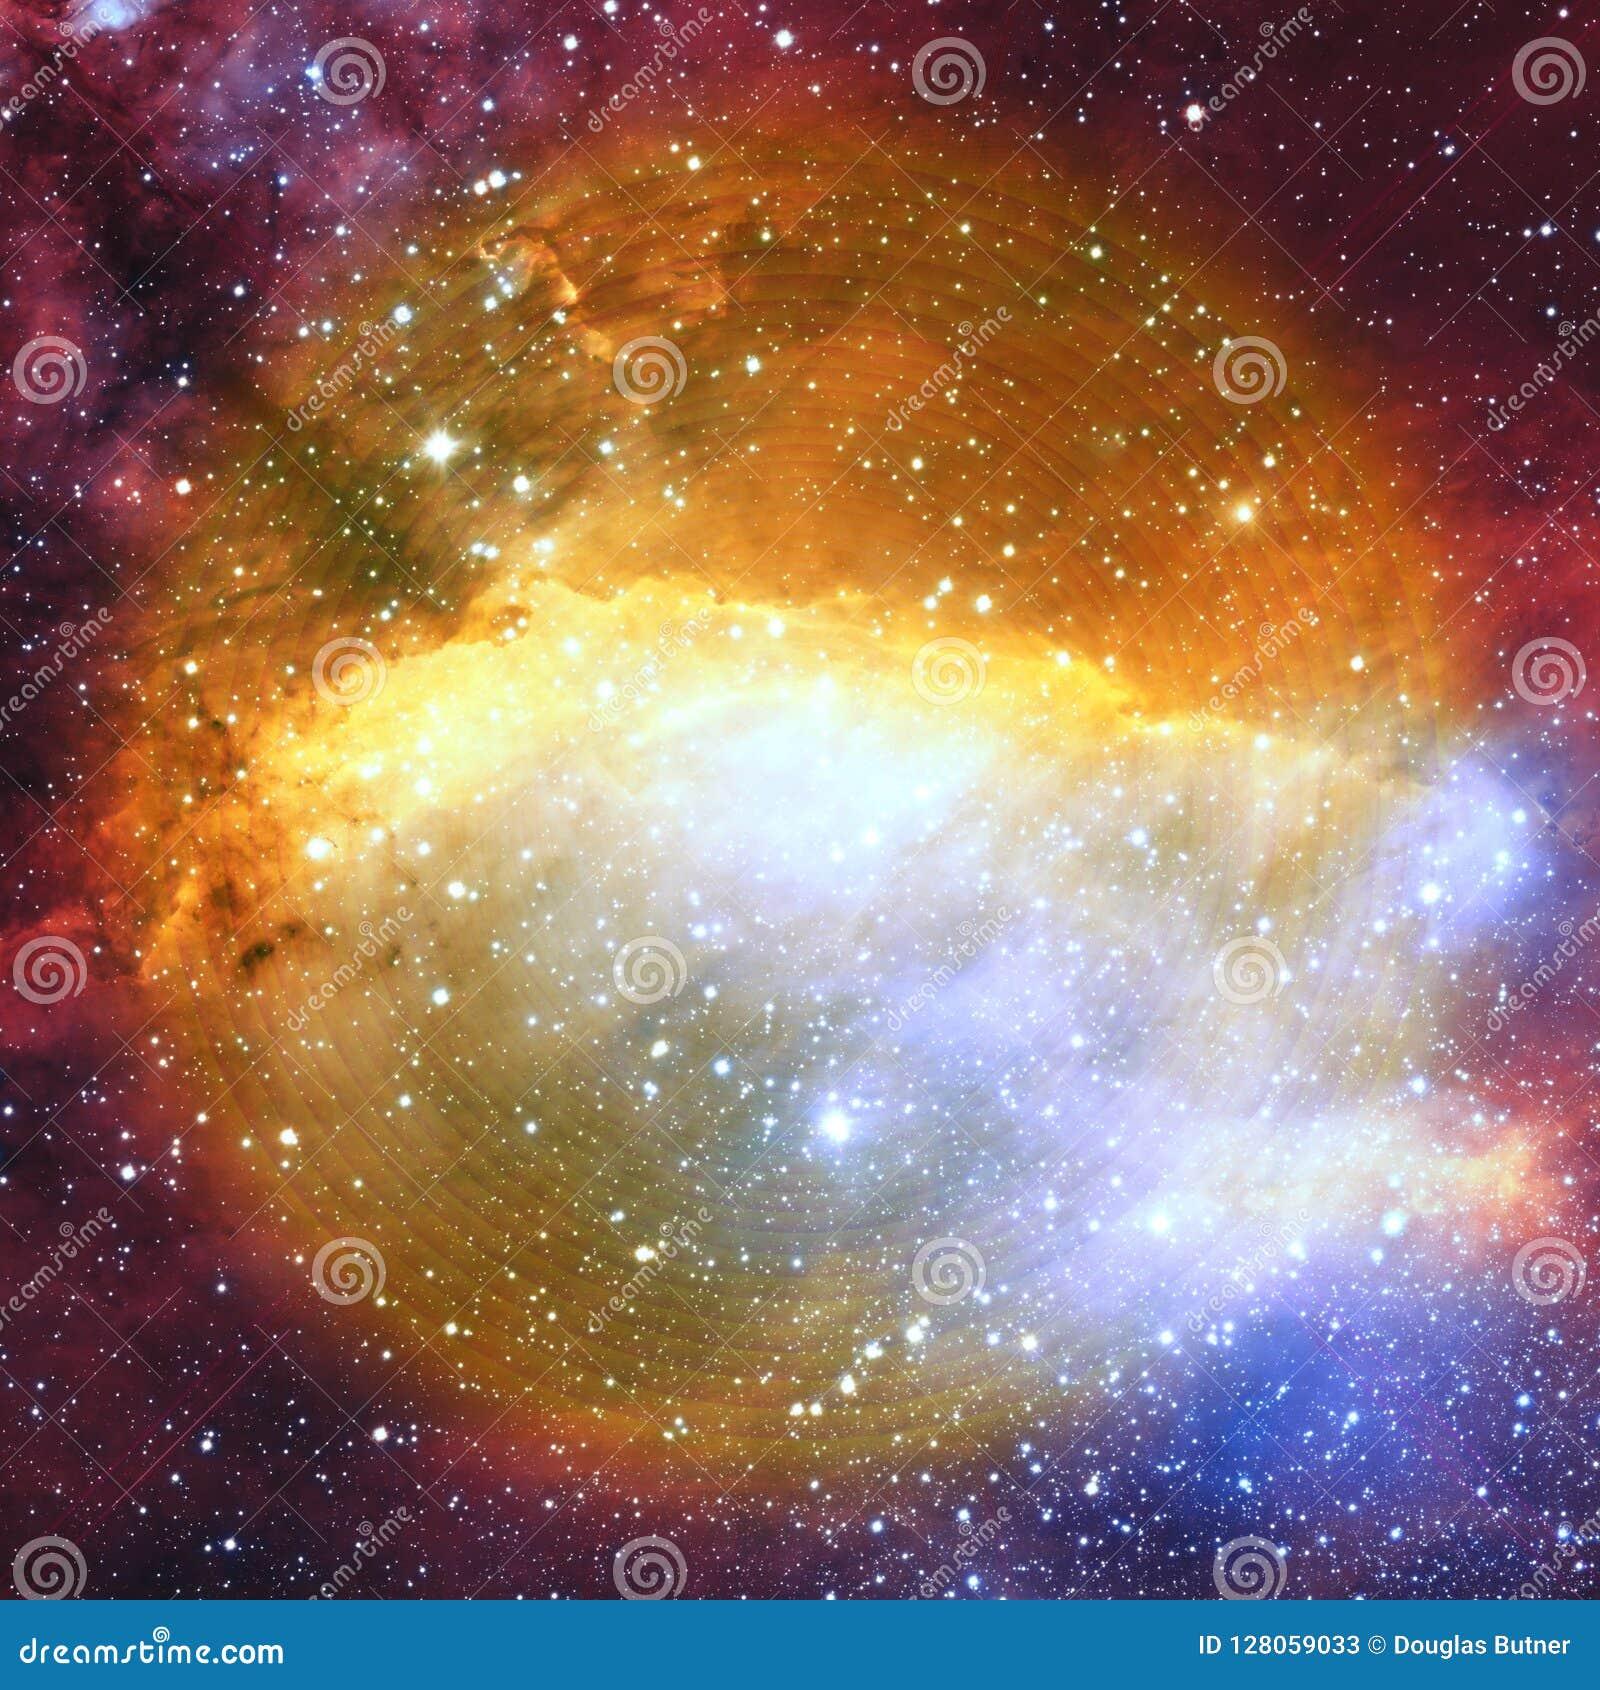 The Eye Of God In Space Fractal Art Background Wallpaper Stock